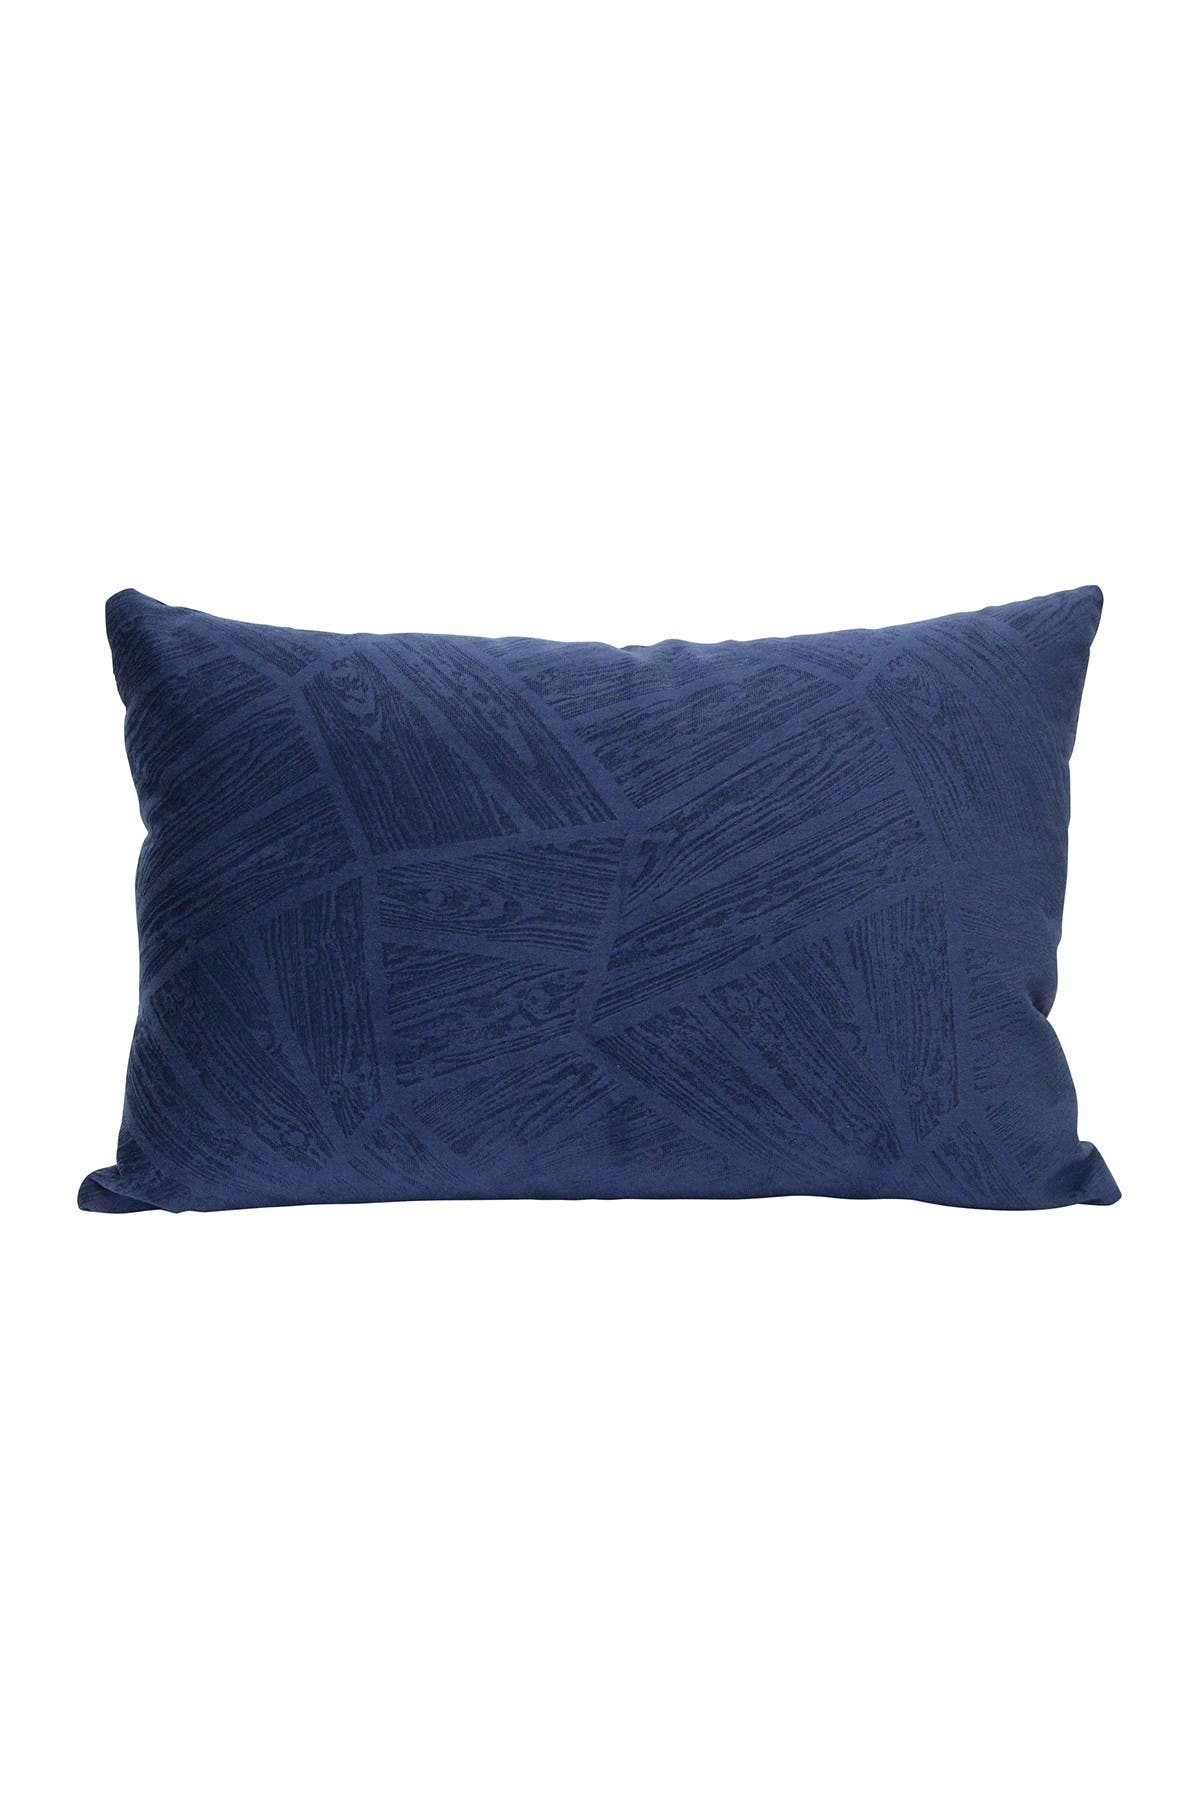 Image of Stratton Home Regal Blue Velvet Lumbar Pillow